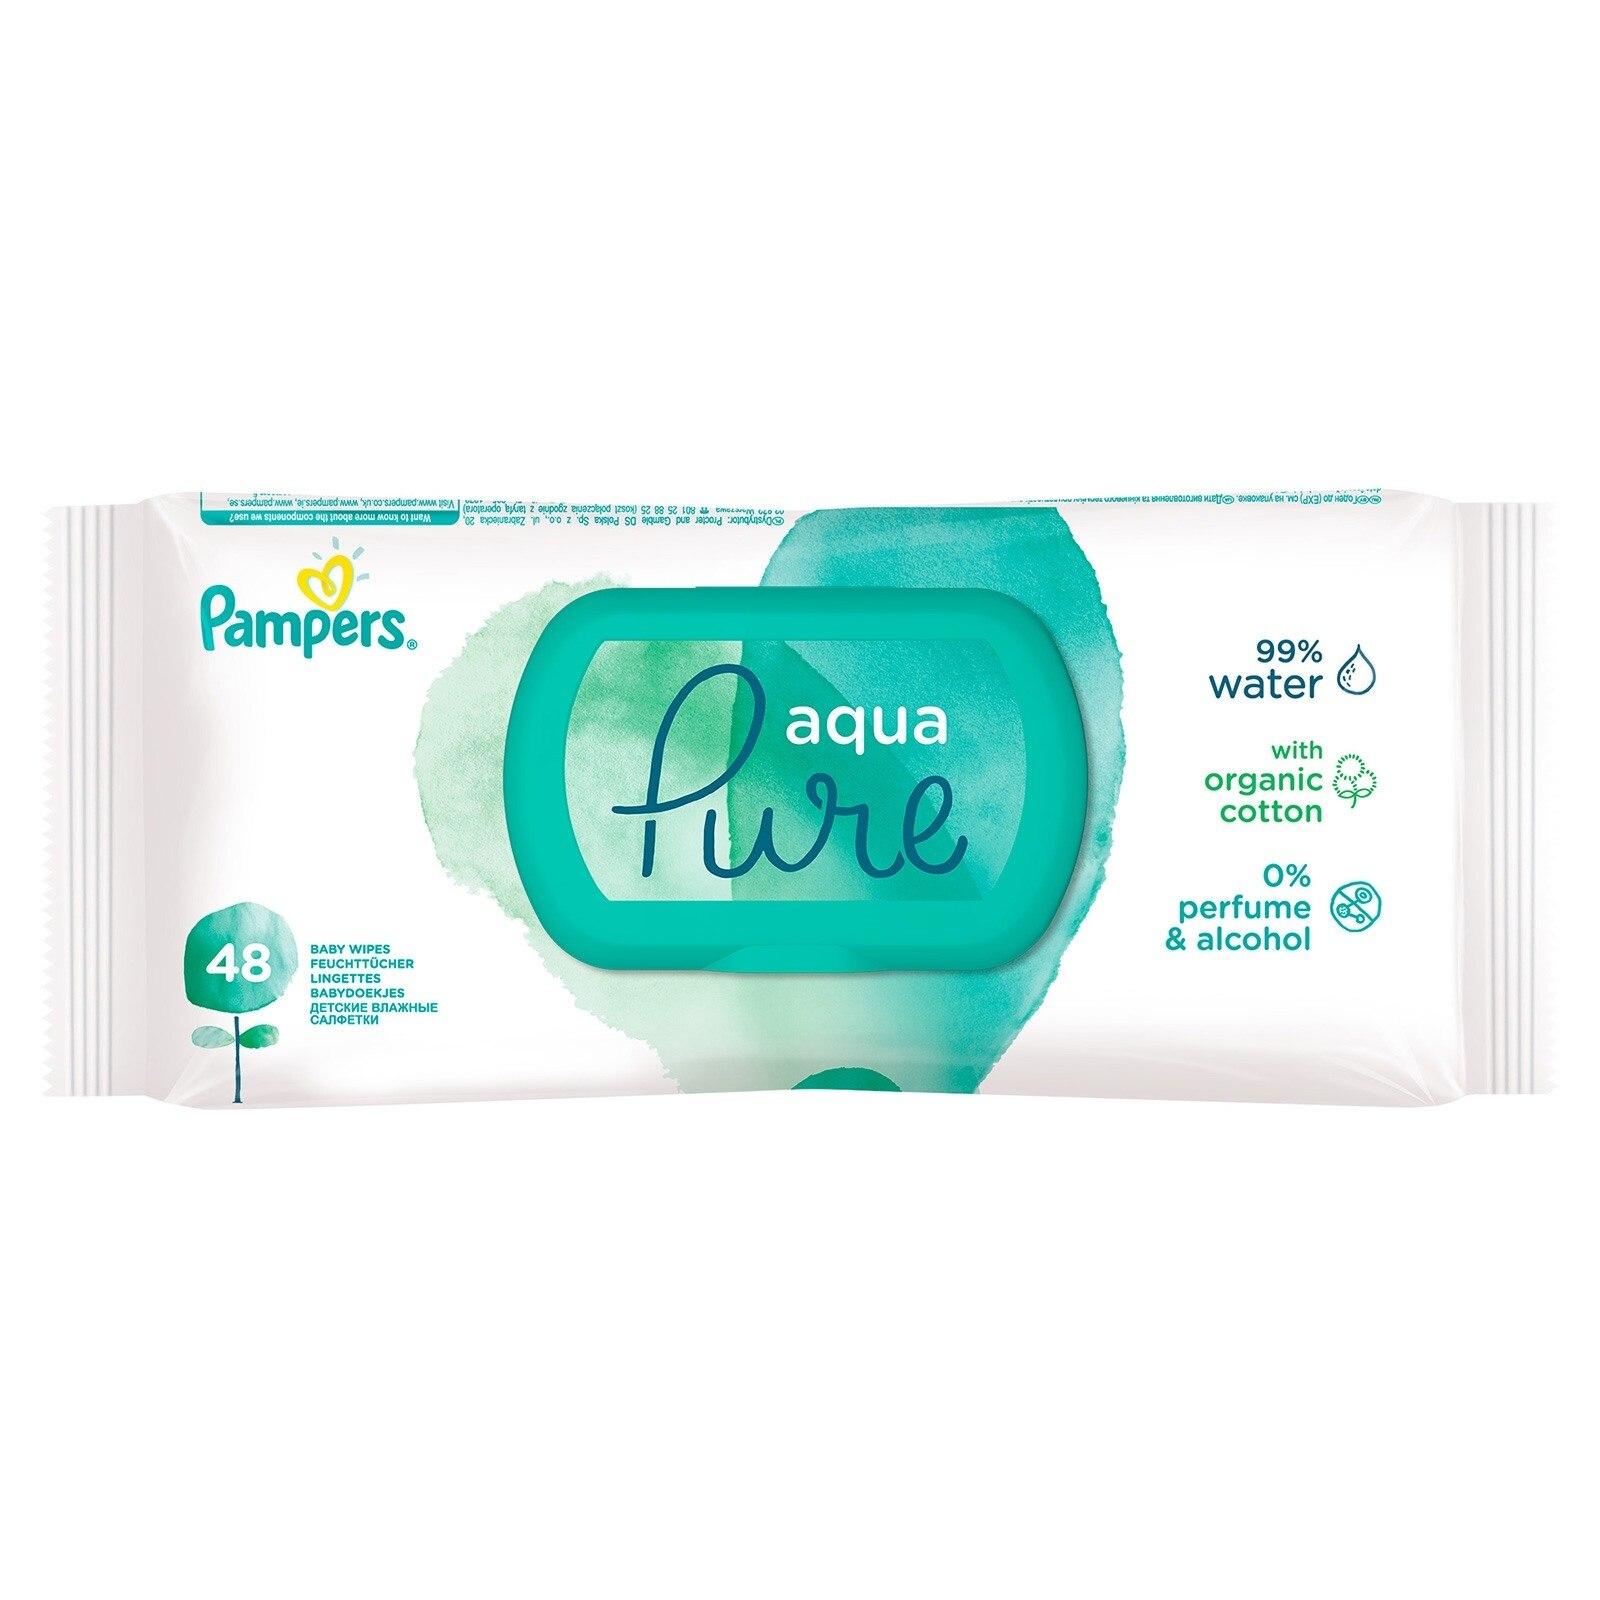 Ebebek Prima Pampers Aqua Pure Wet Towel Single Pack 48 Pcs